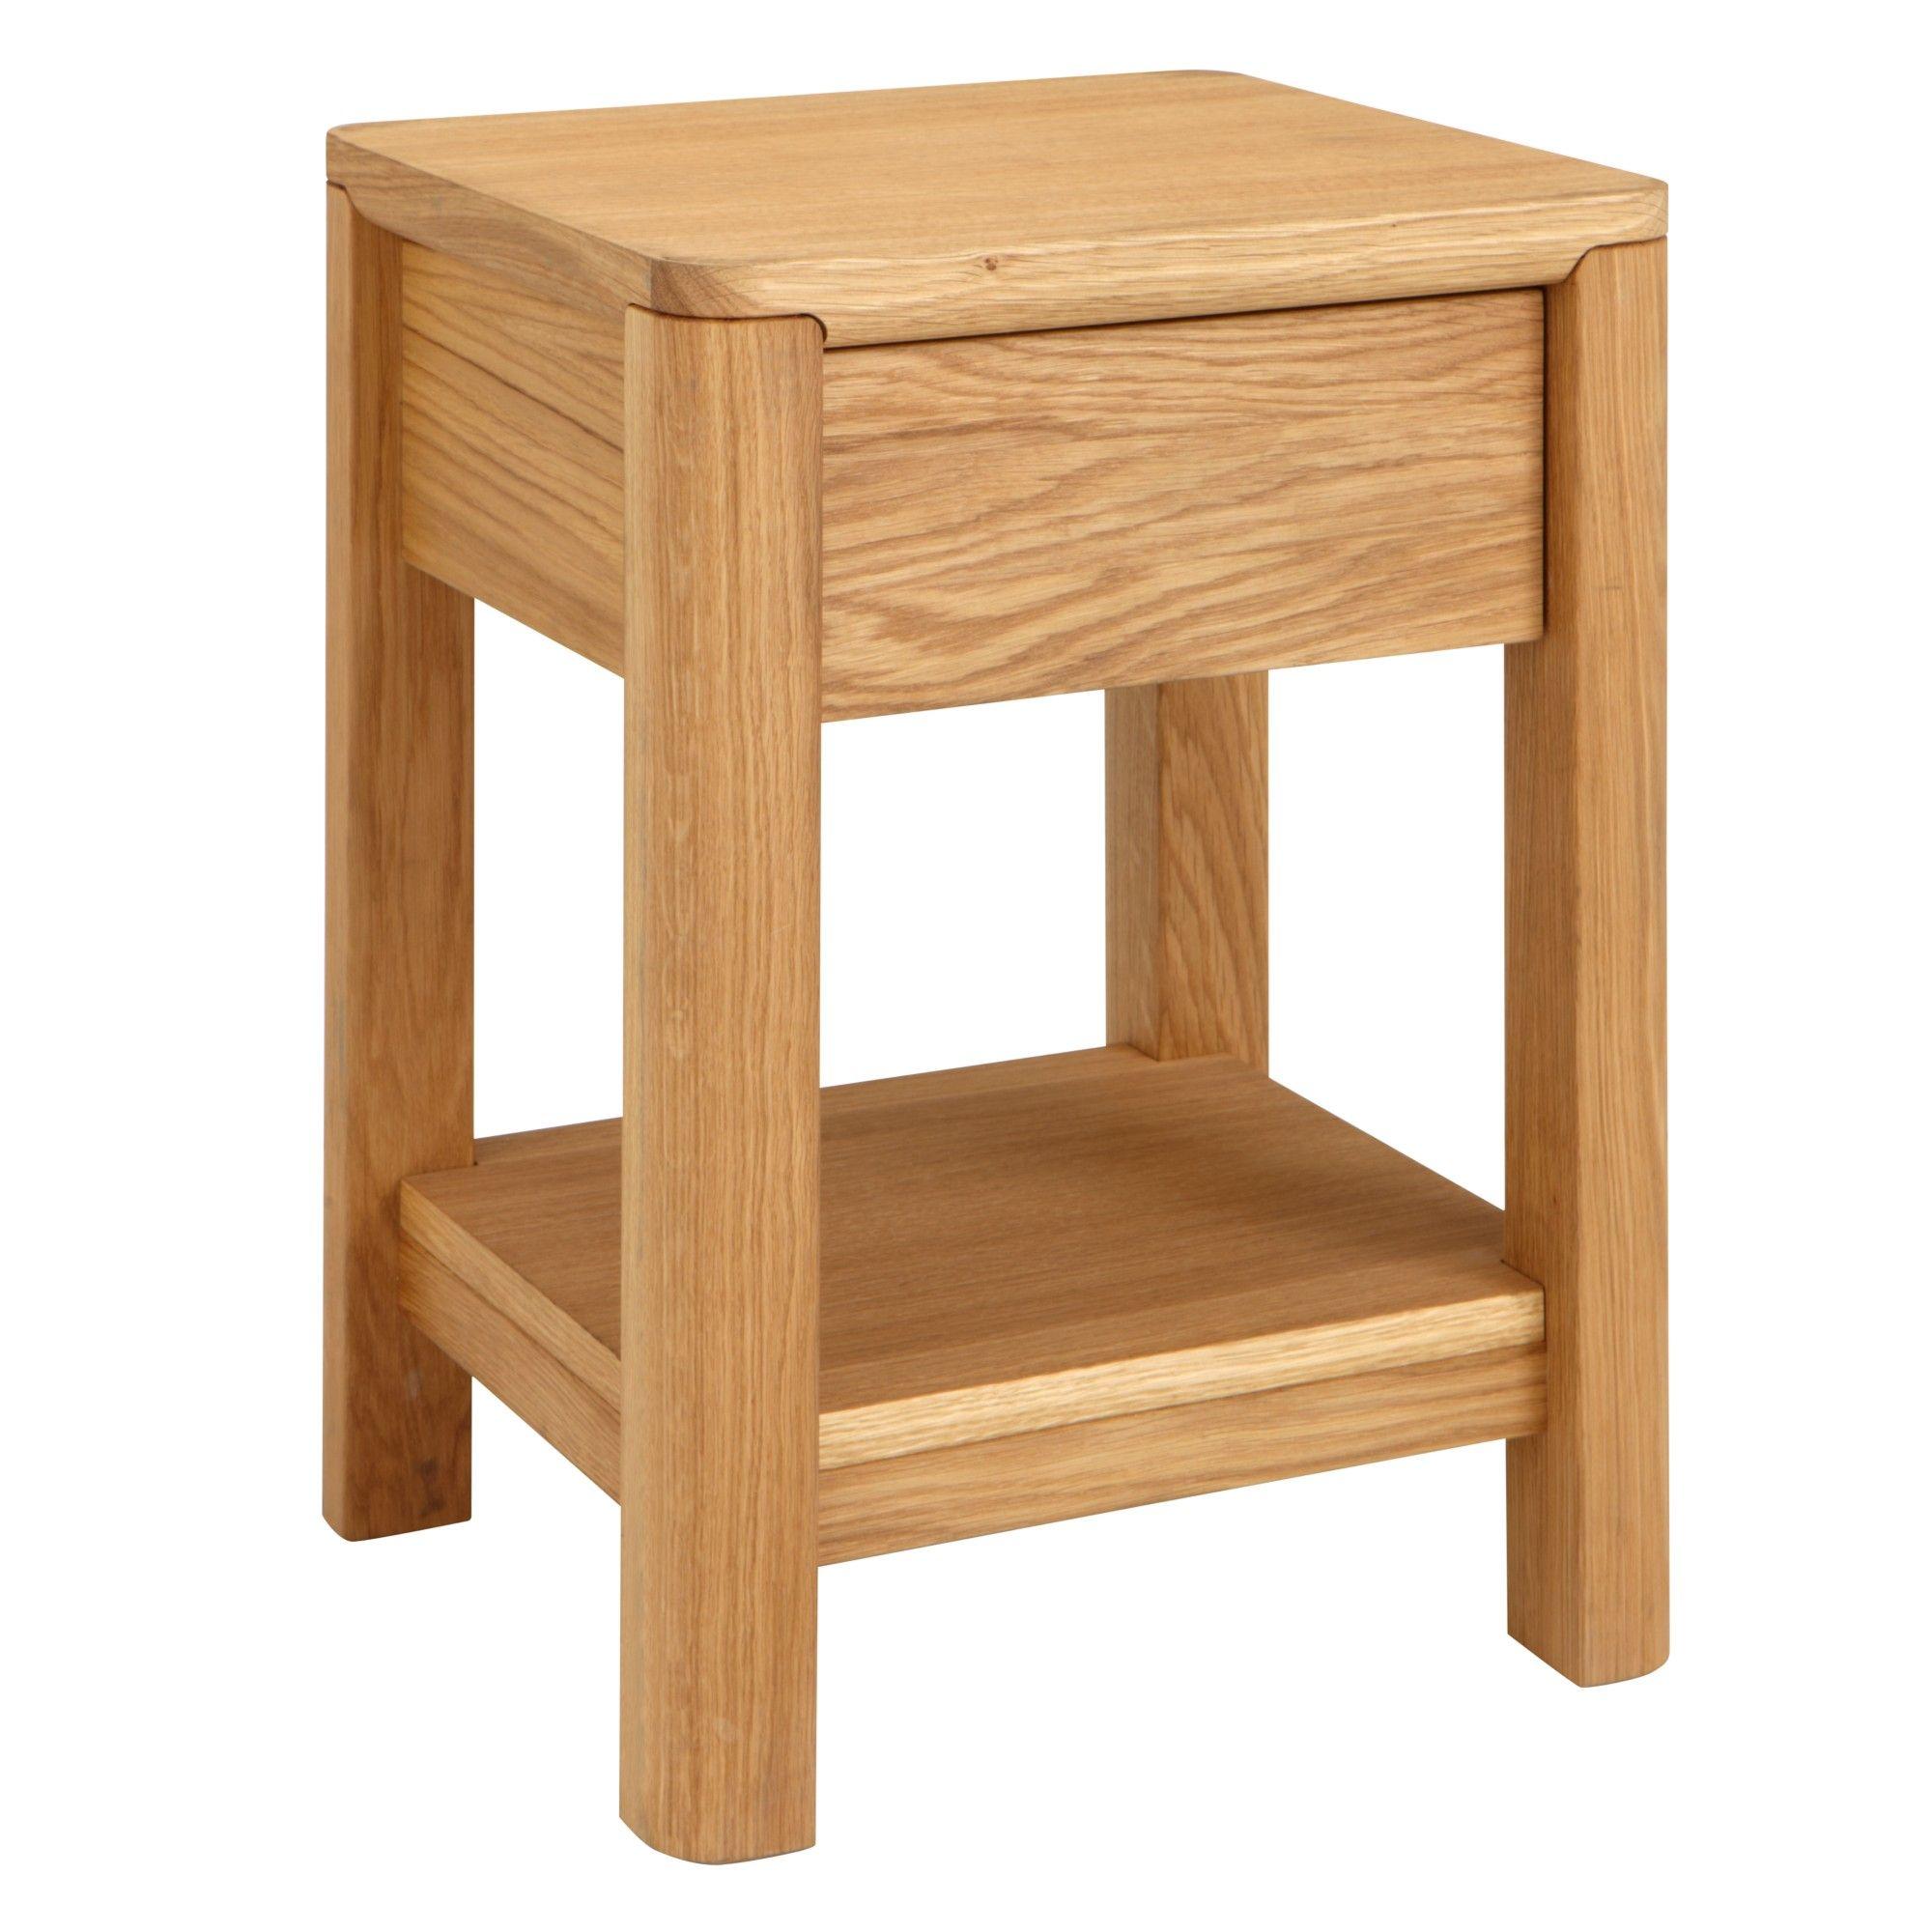 john lewis seymour side table oiled oak kitchen family. Black Bedroom Furniture Sets. Home Design Ideas